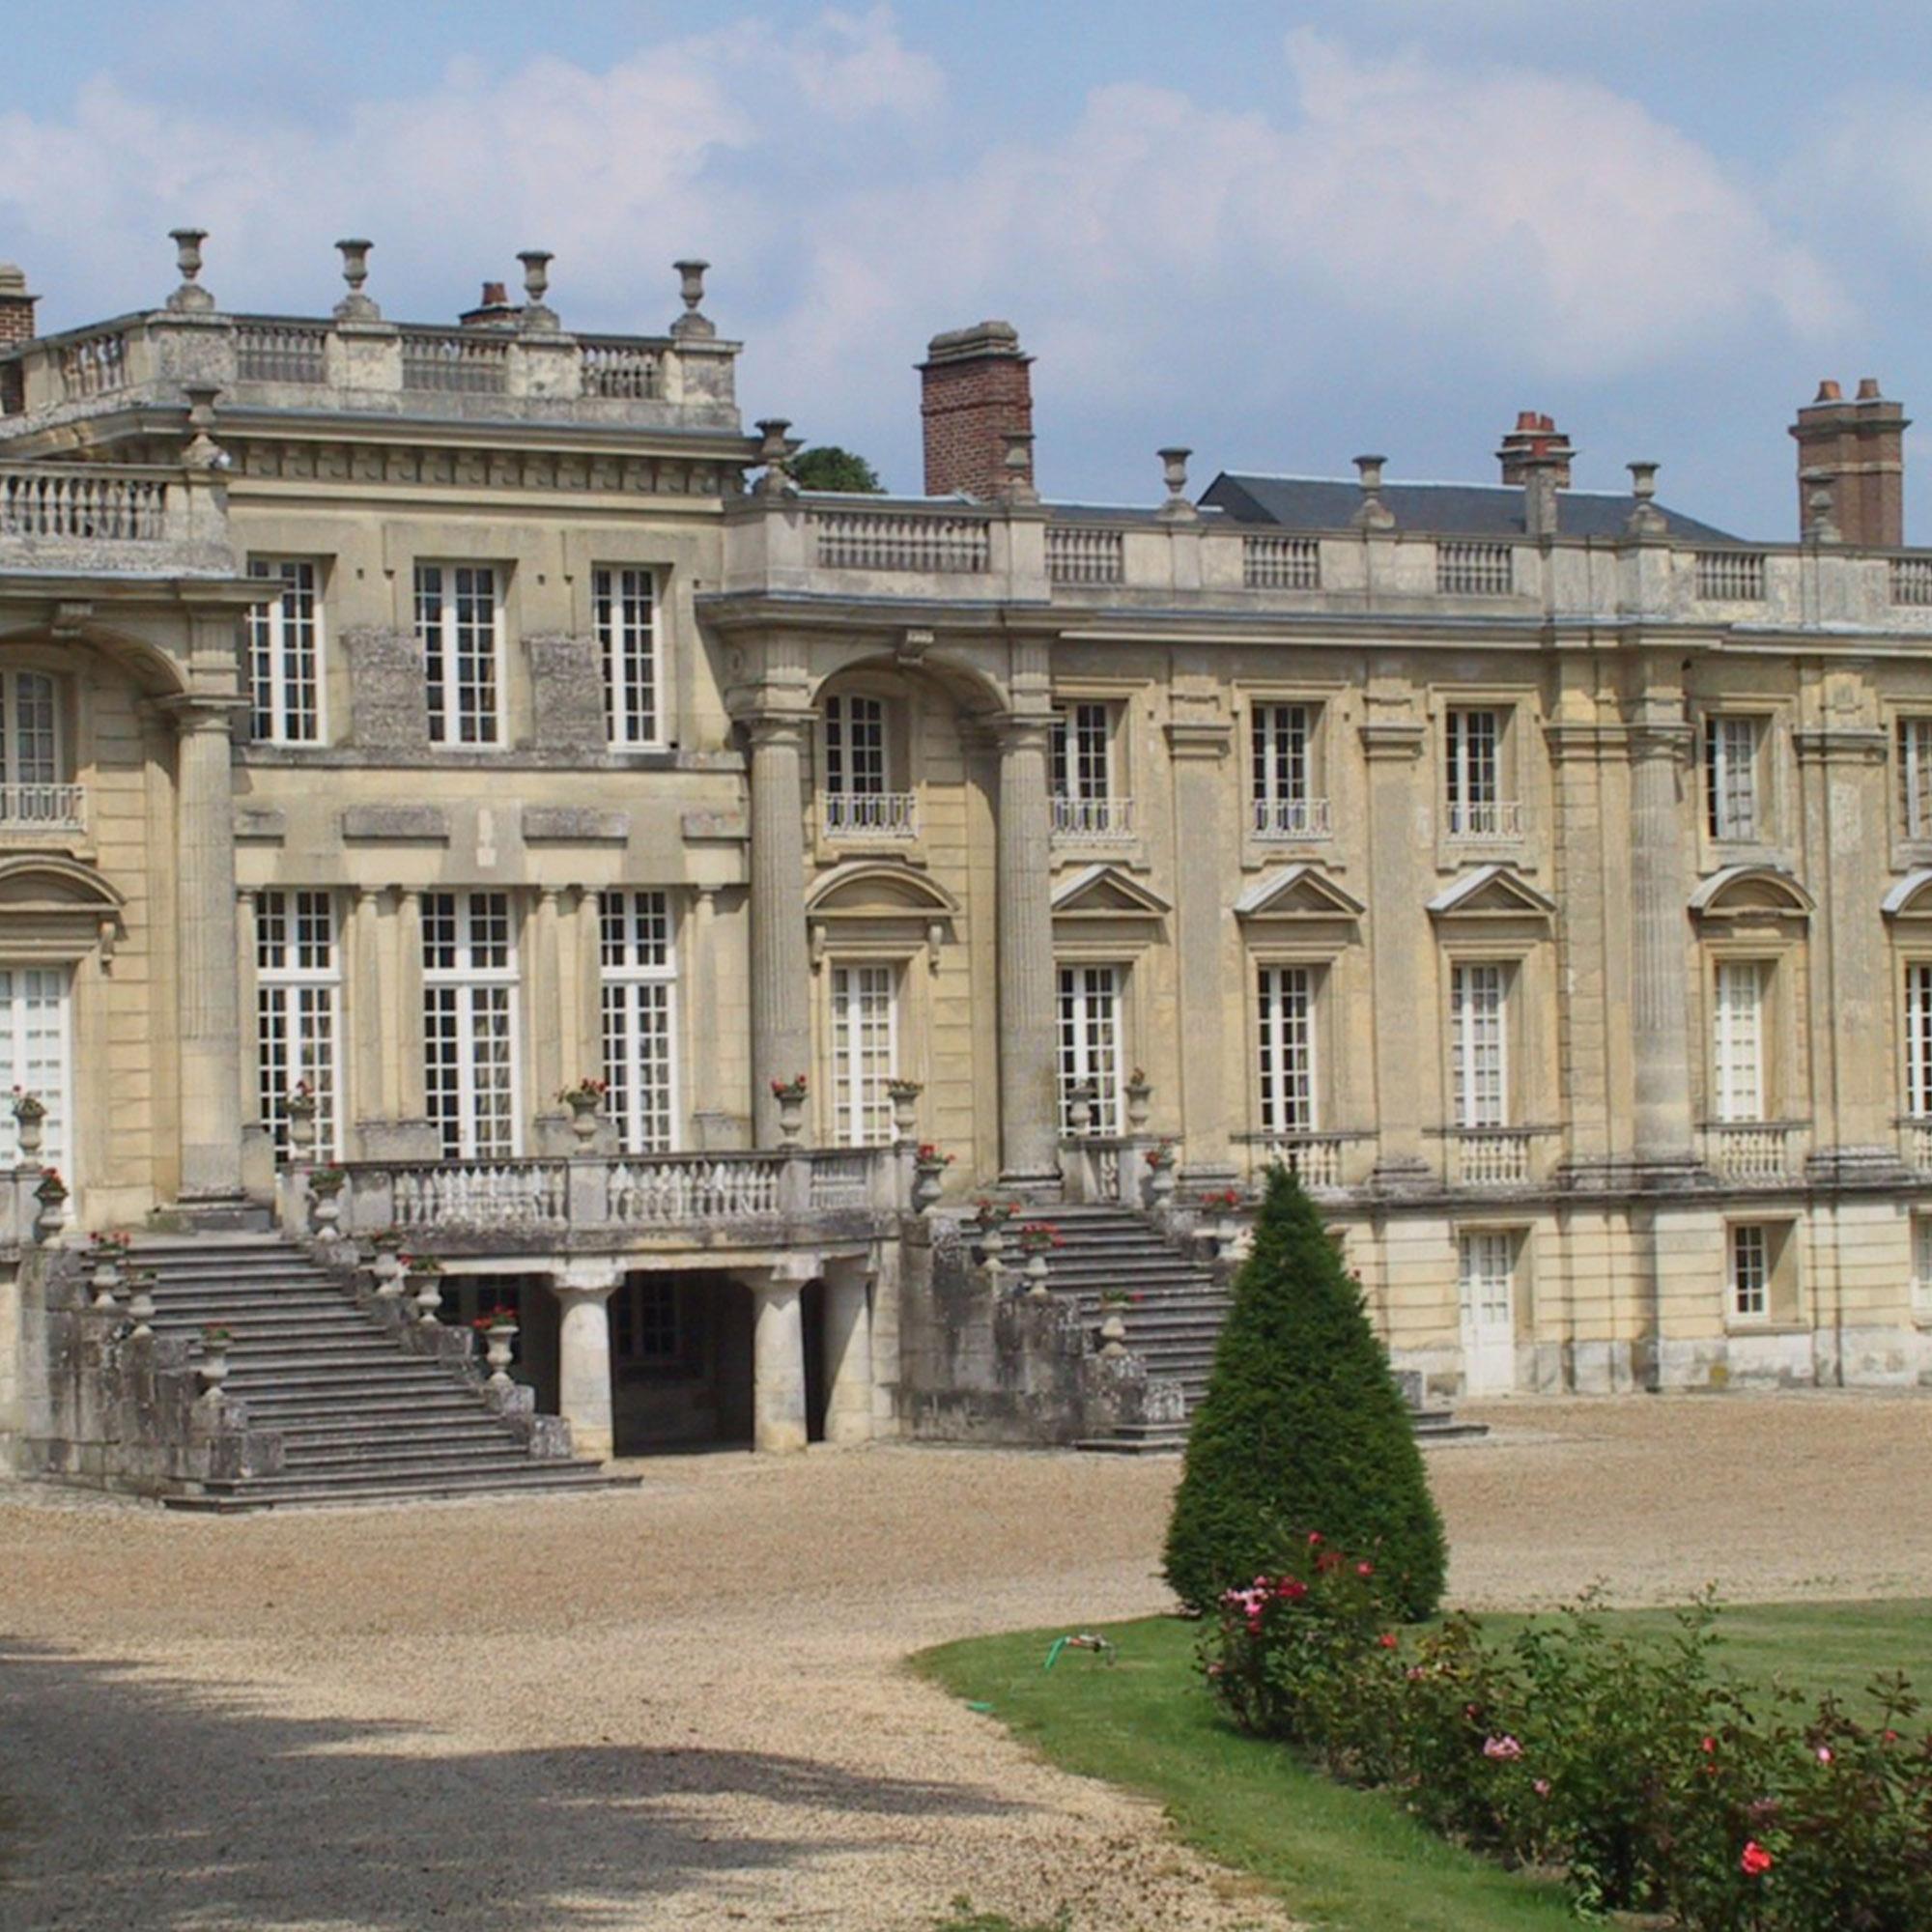 chateau_de_Versigny_gîte_saint_germain_oise_versigny_33